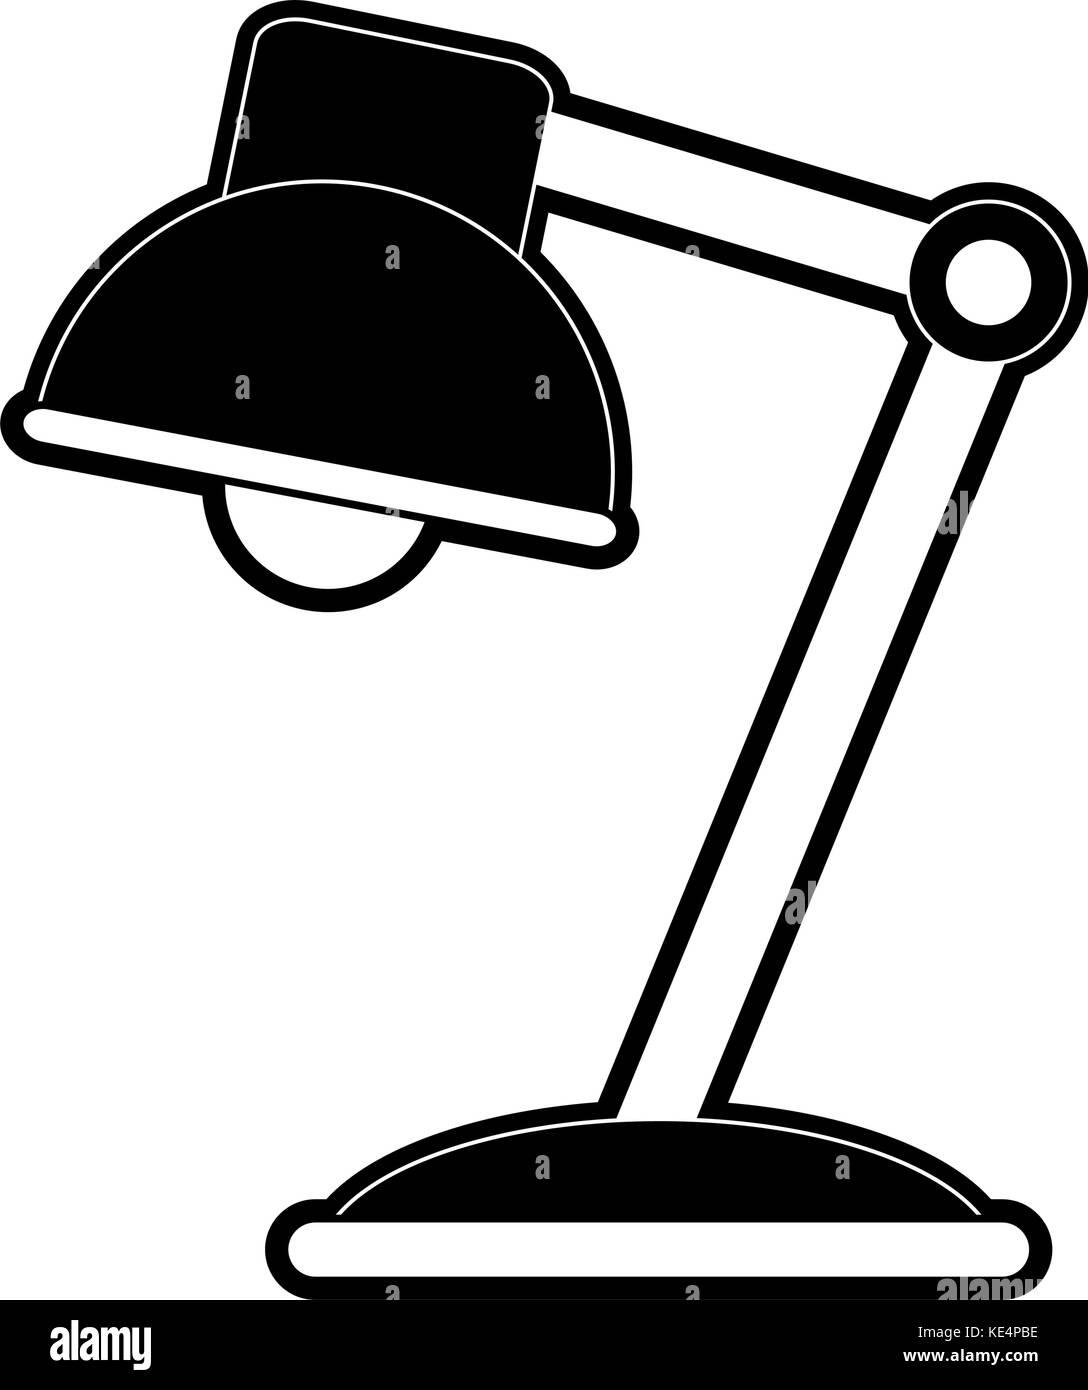 Study light lamp - Stock Vector